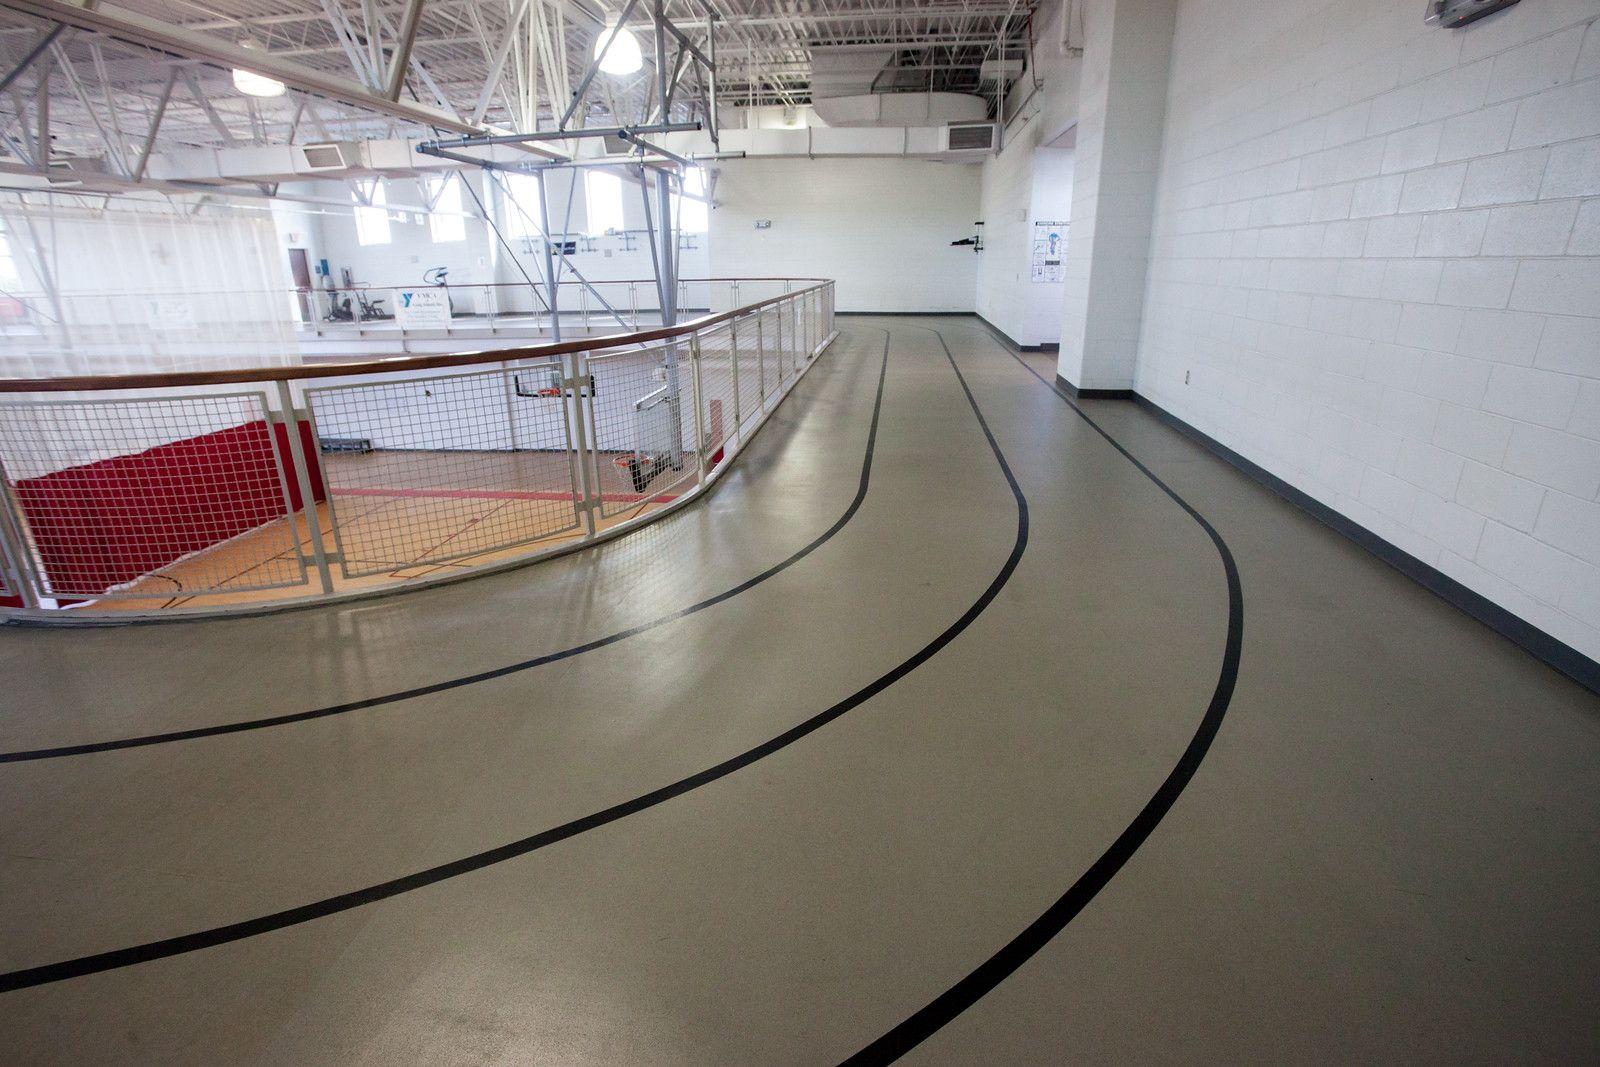 Flooring For Tracks Gym Flooring Wellness Design Flooring